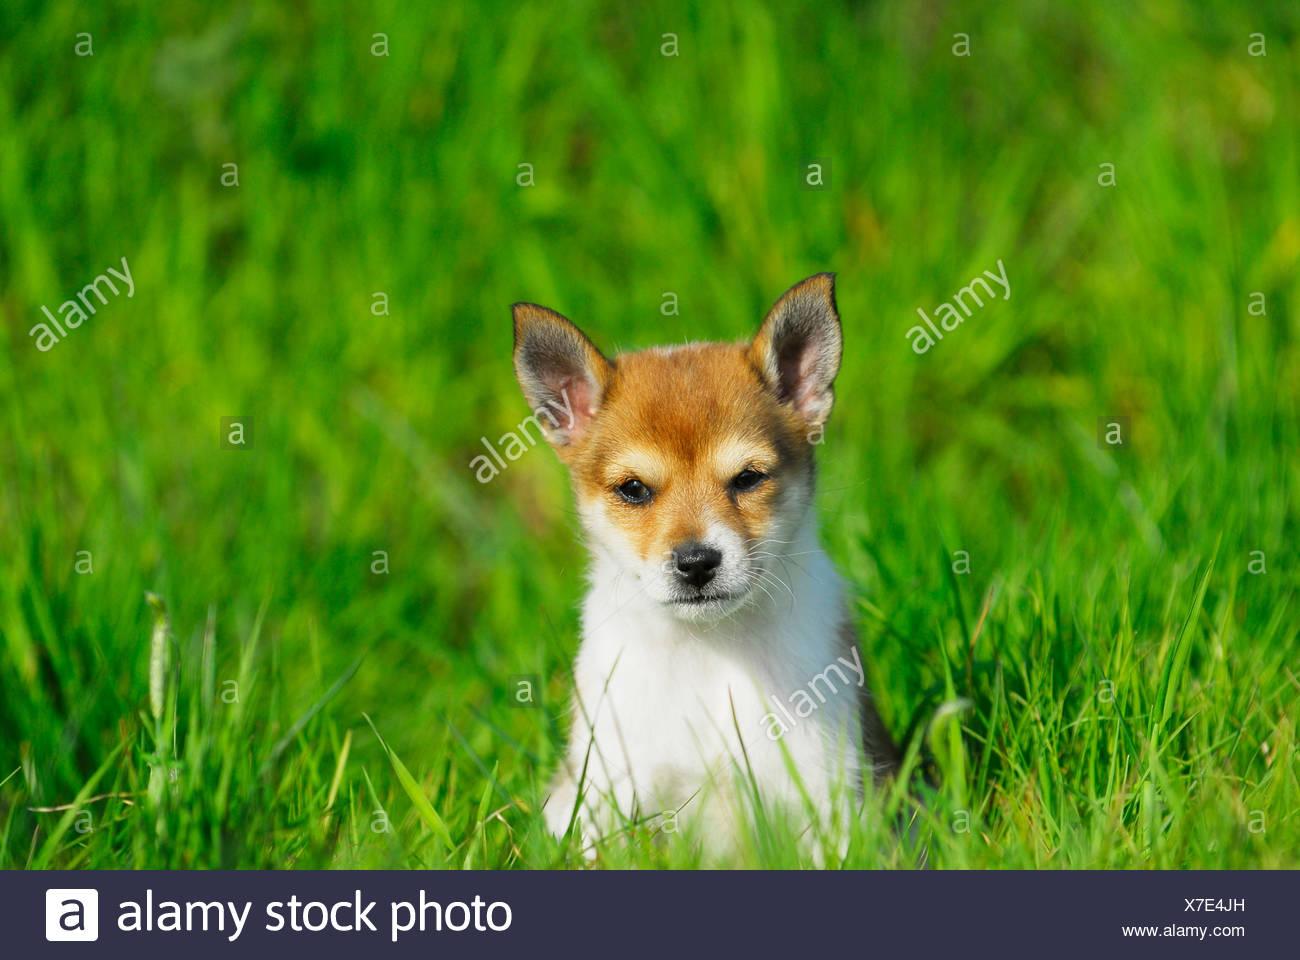 Norwegian Lundehund Puppy Stock Photo 279979465 Alamy